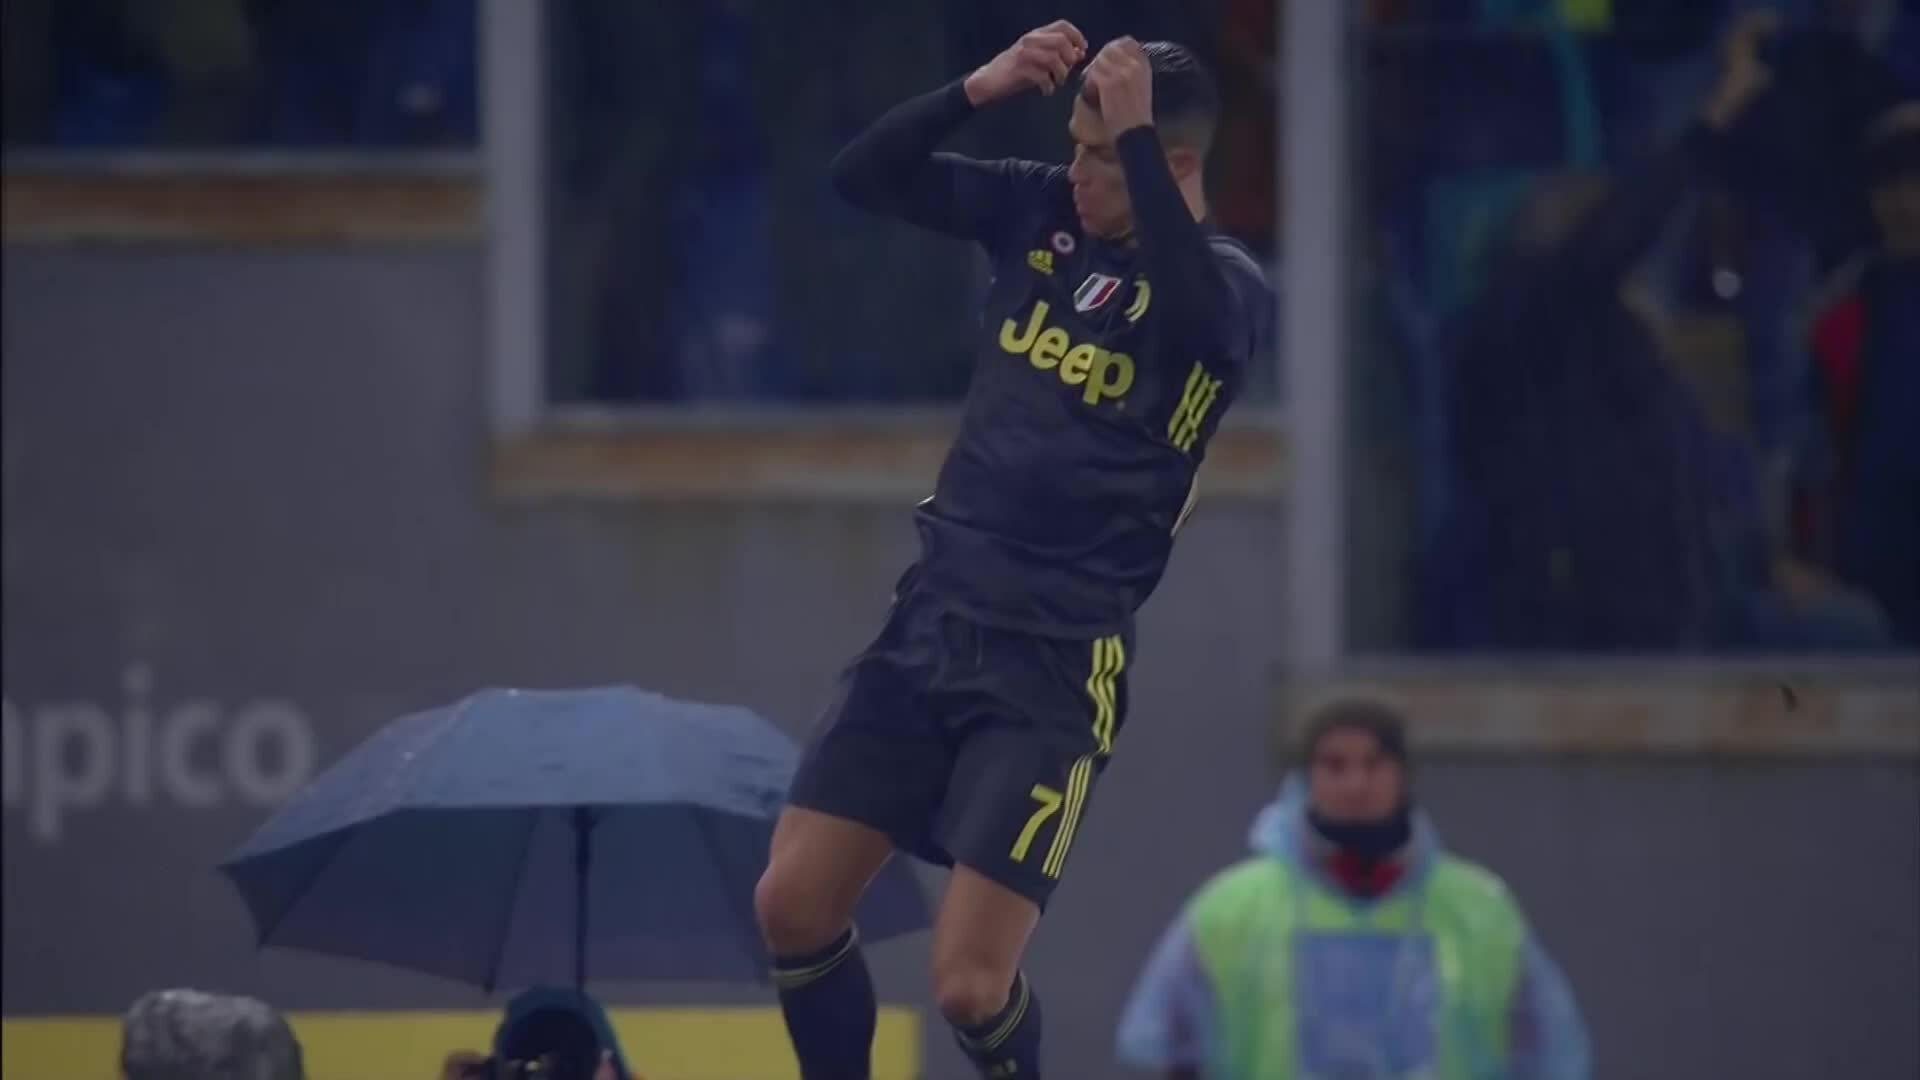 Những pha ghi bàn của Ronaldo ở Serie A mùa giải 2019